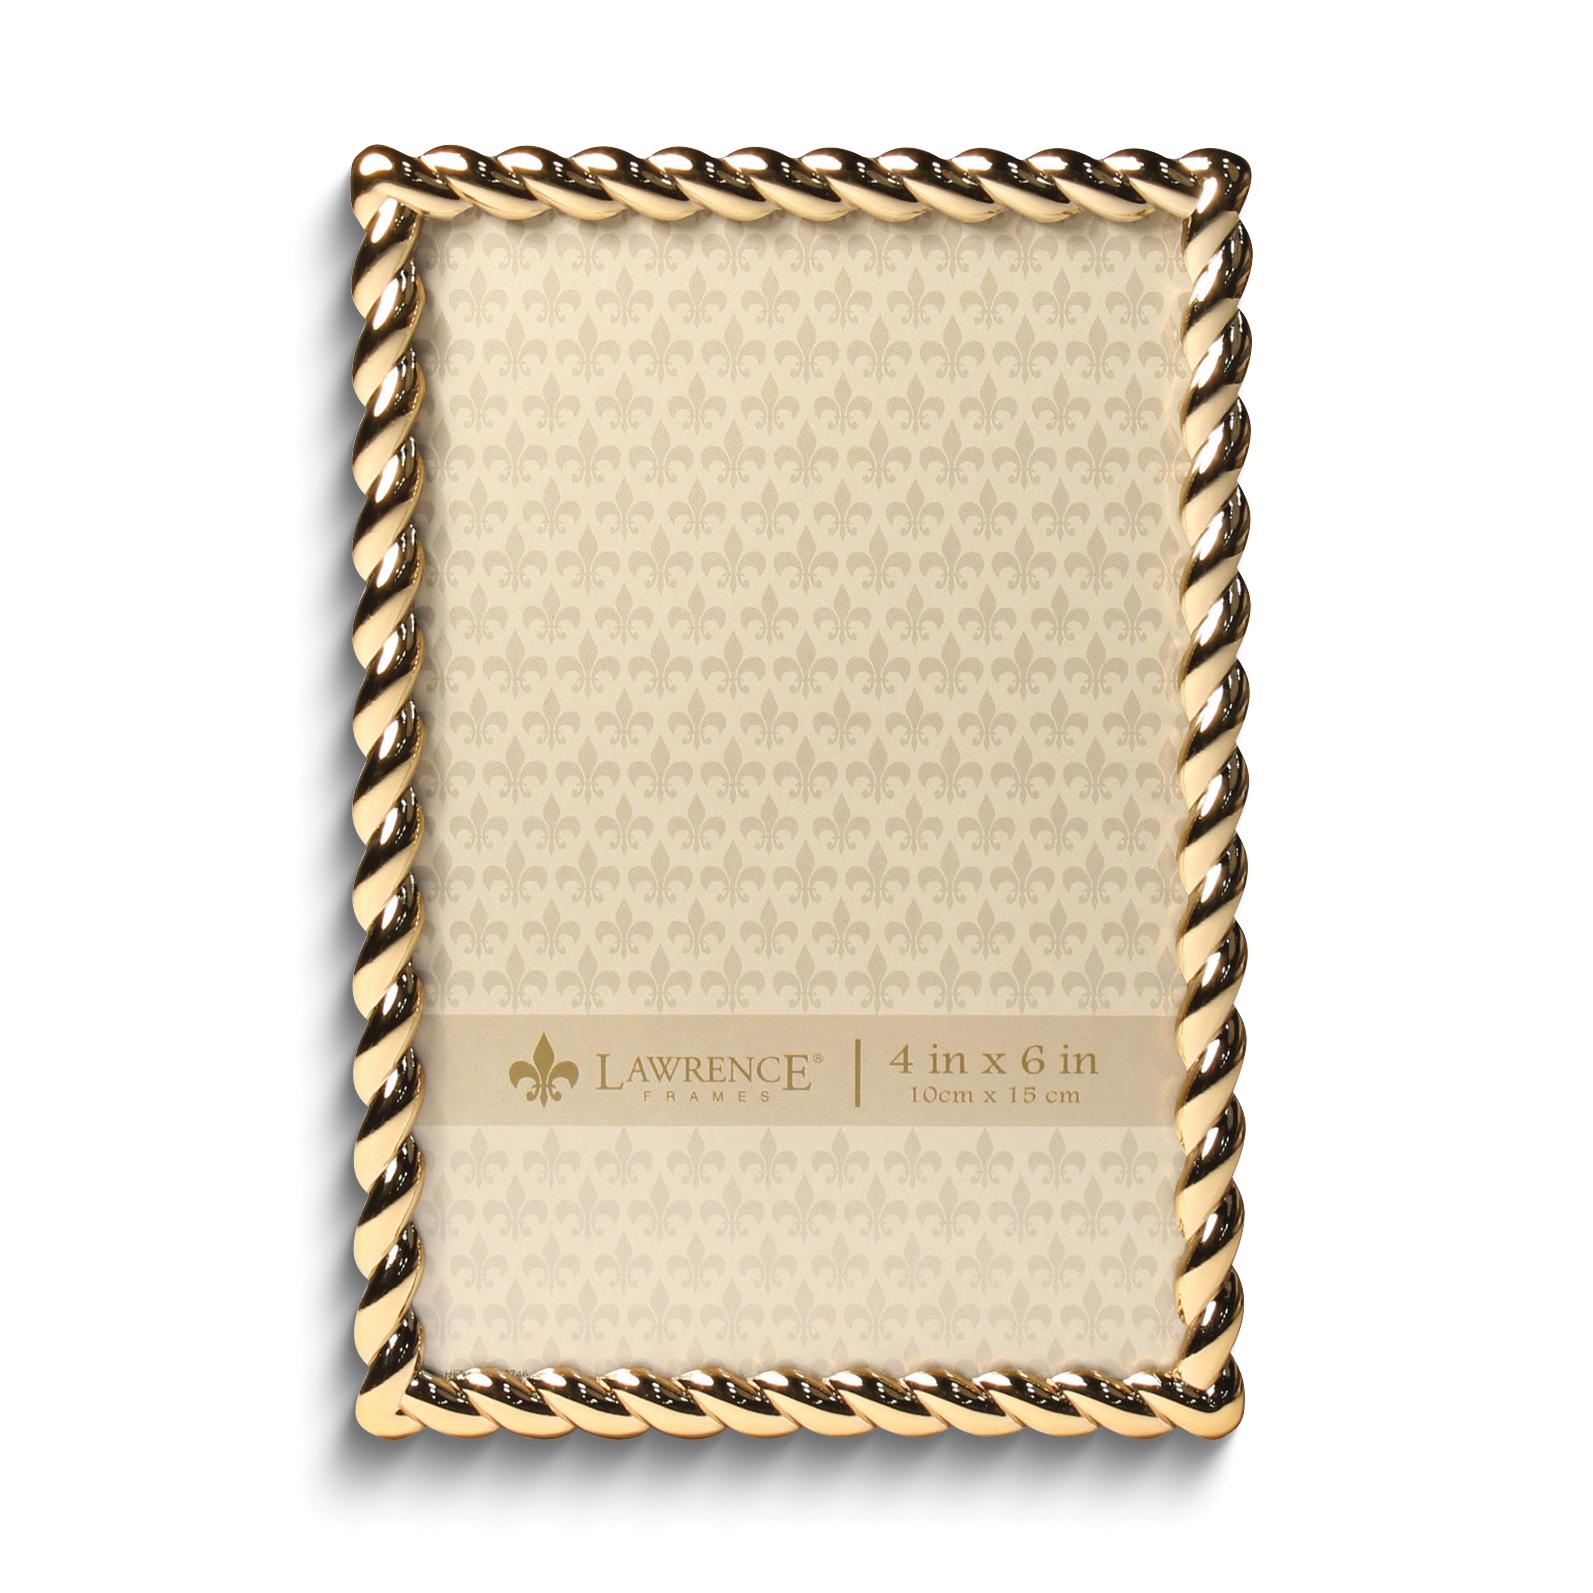 Gold-tone 4x6 Rope Photo Frame 751148070133 | eBay